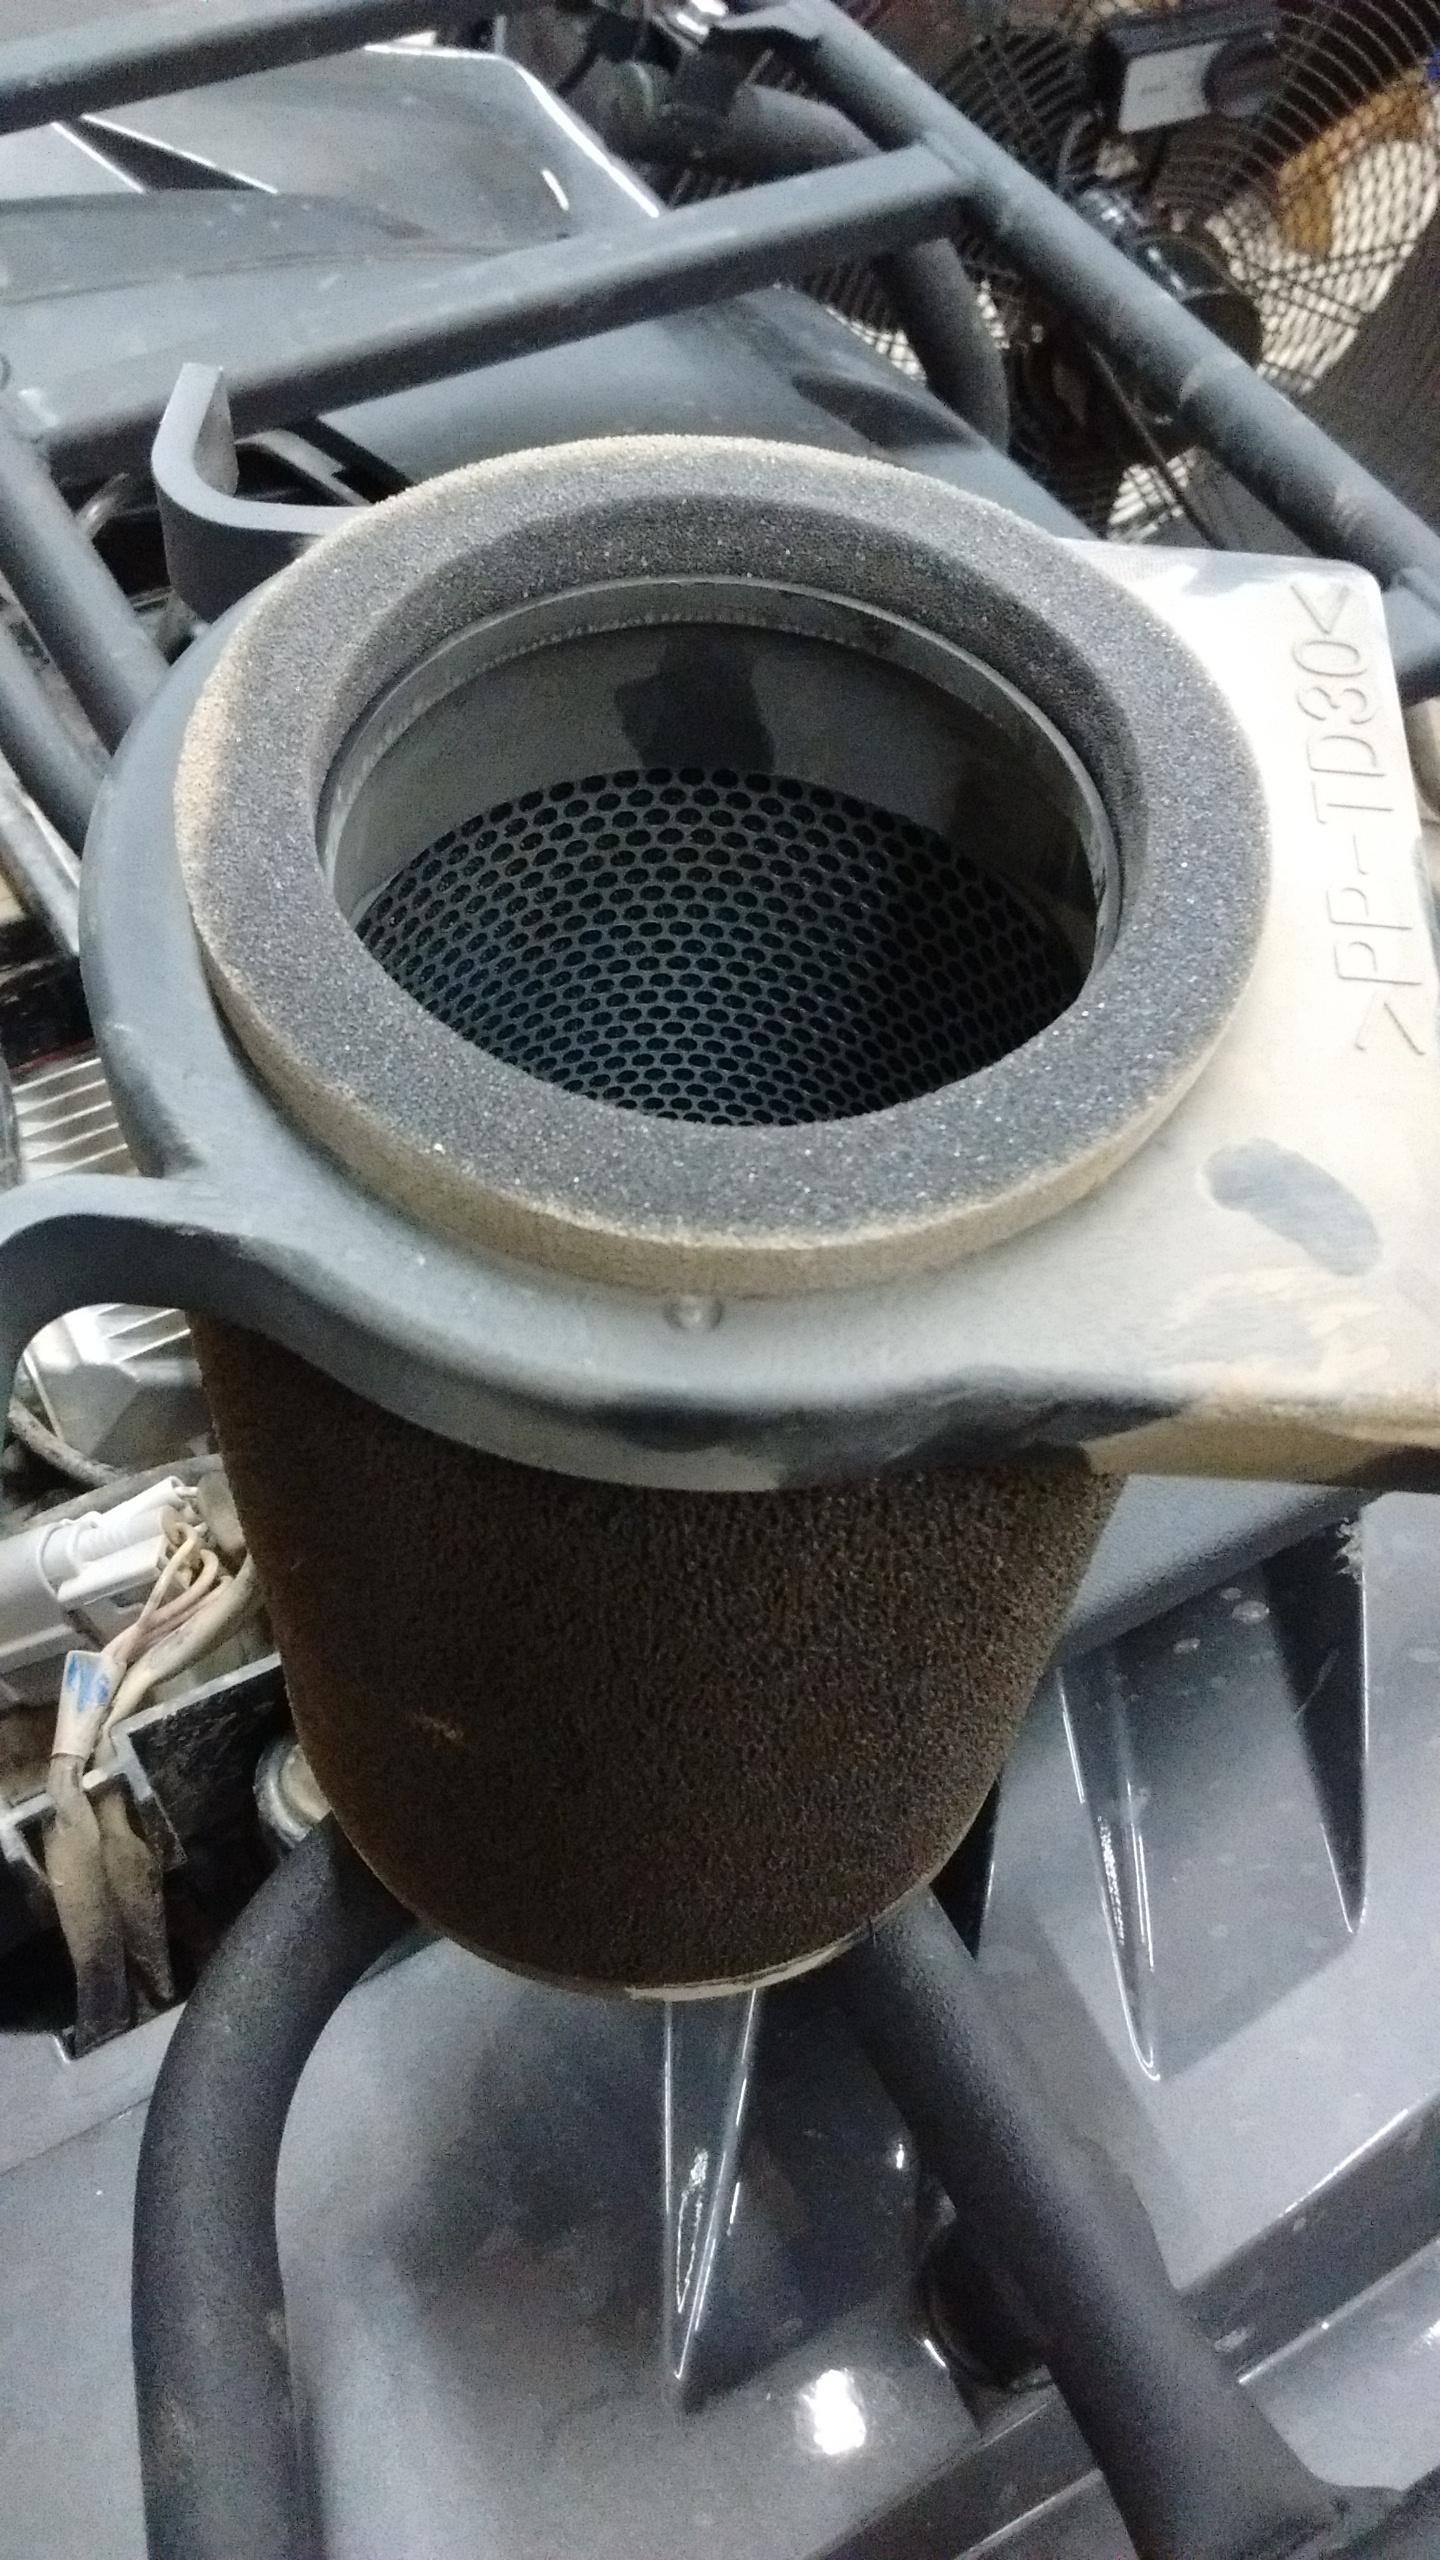 Air filter problems on a 2016 Kodiak 700 - Yamaha Grizzly ATV Forum